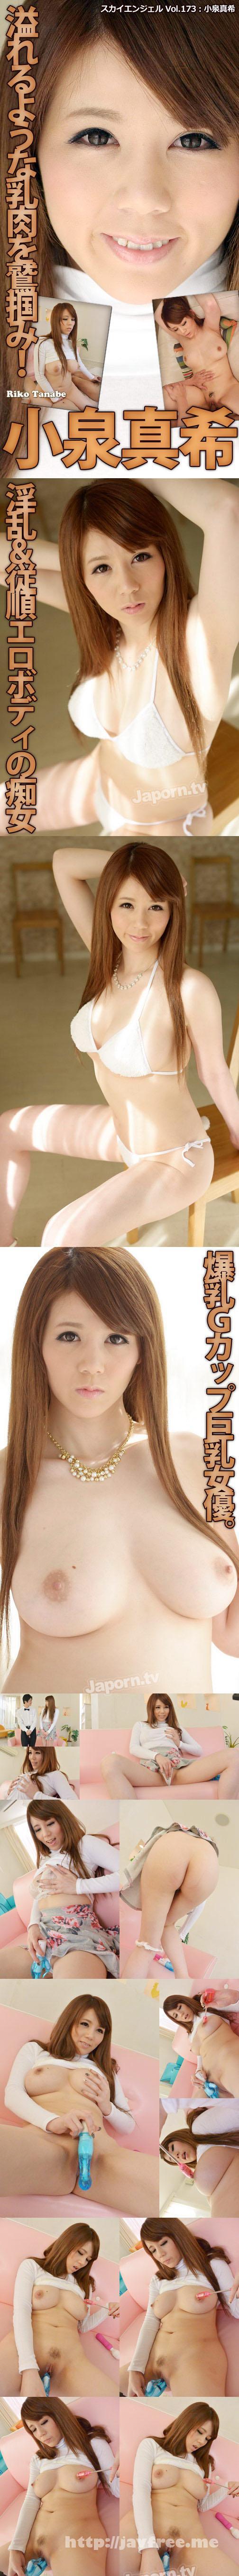 [SKY 290] スカイエンジェル Vol.173 : 小泉真希 小泉真希 SKY Maki Koizumi